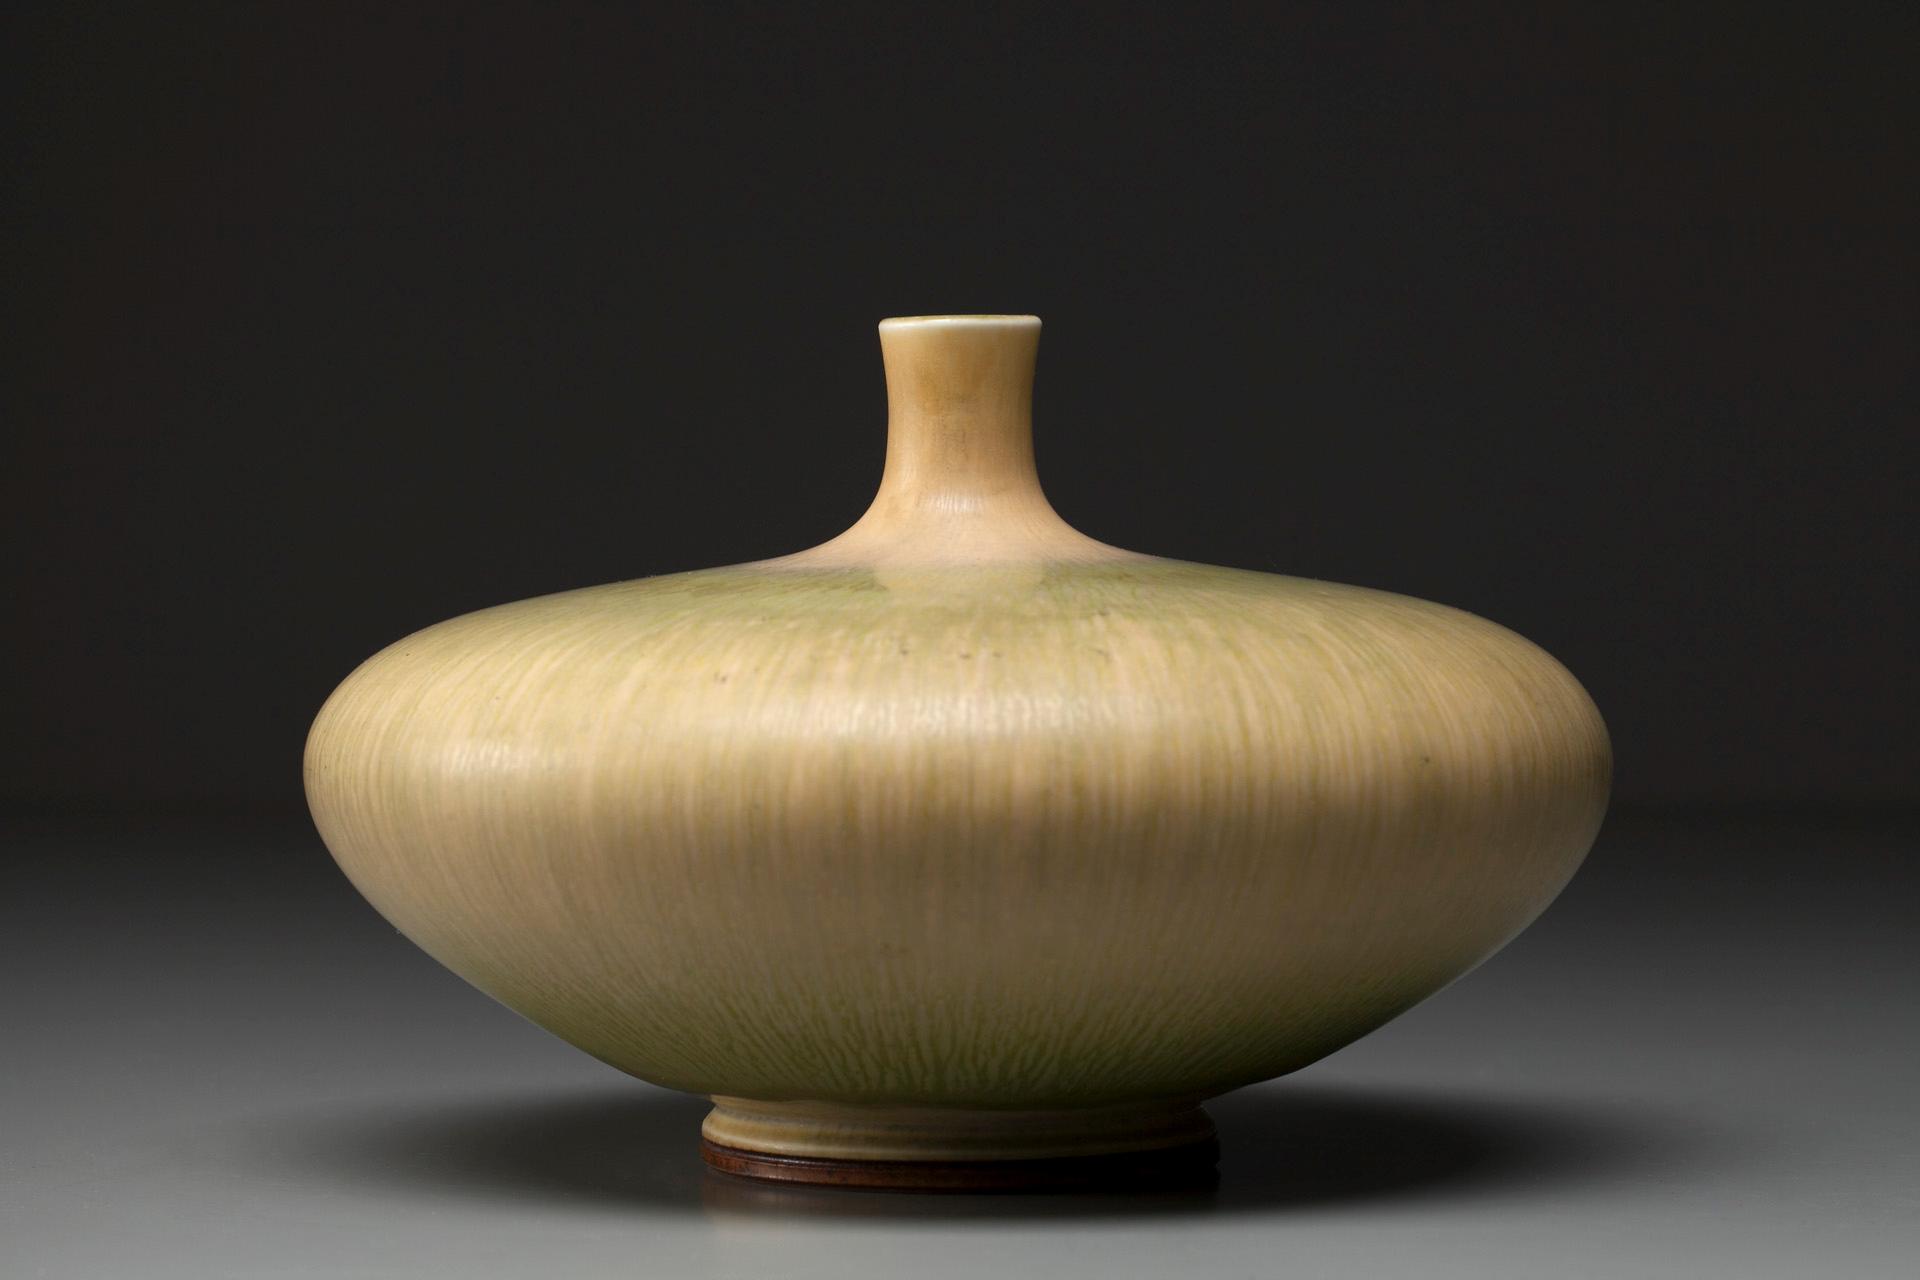 svensk keramik Svensk keramik og stentøj hitter   Skandinaviskdesign.dk svensk keramik